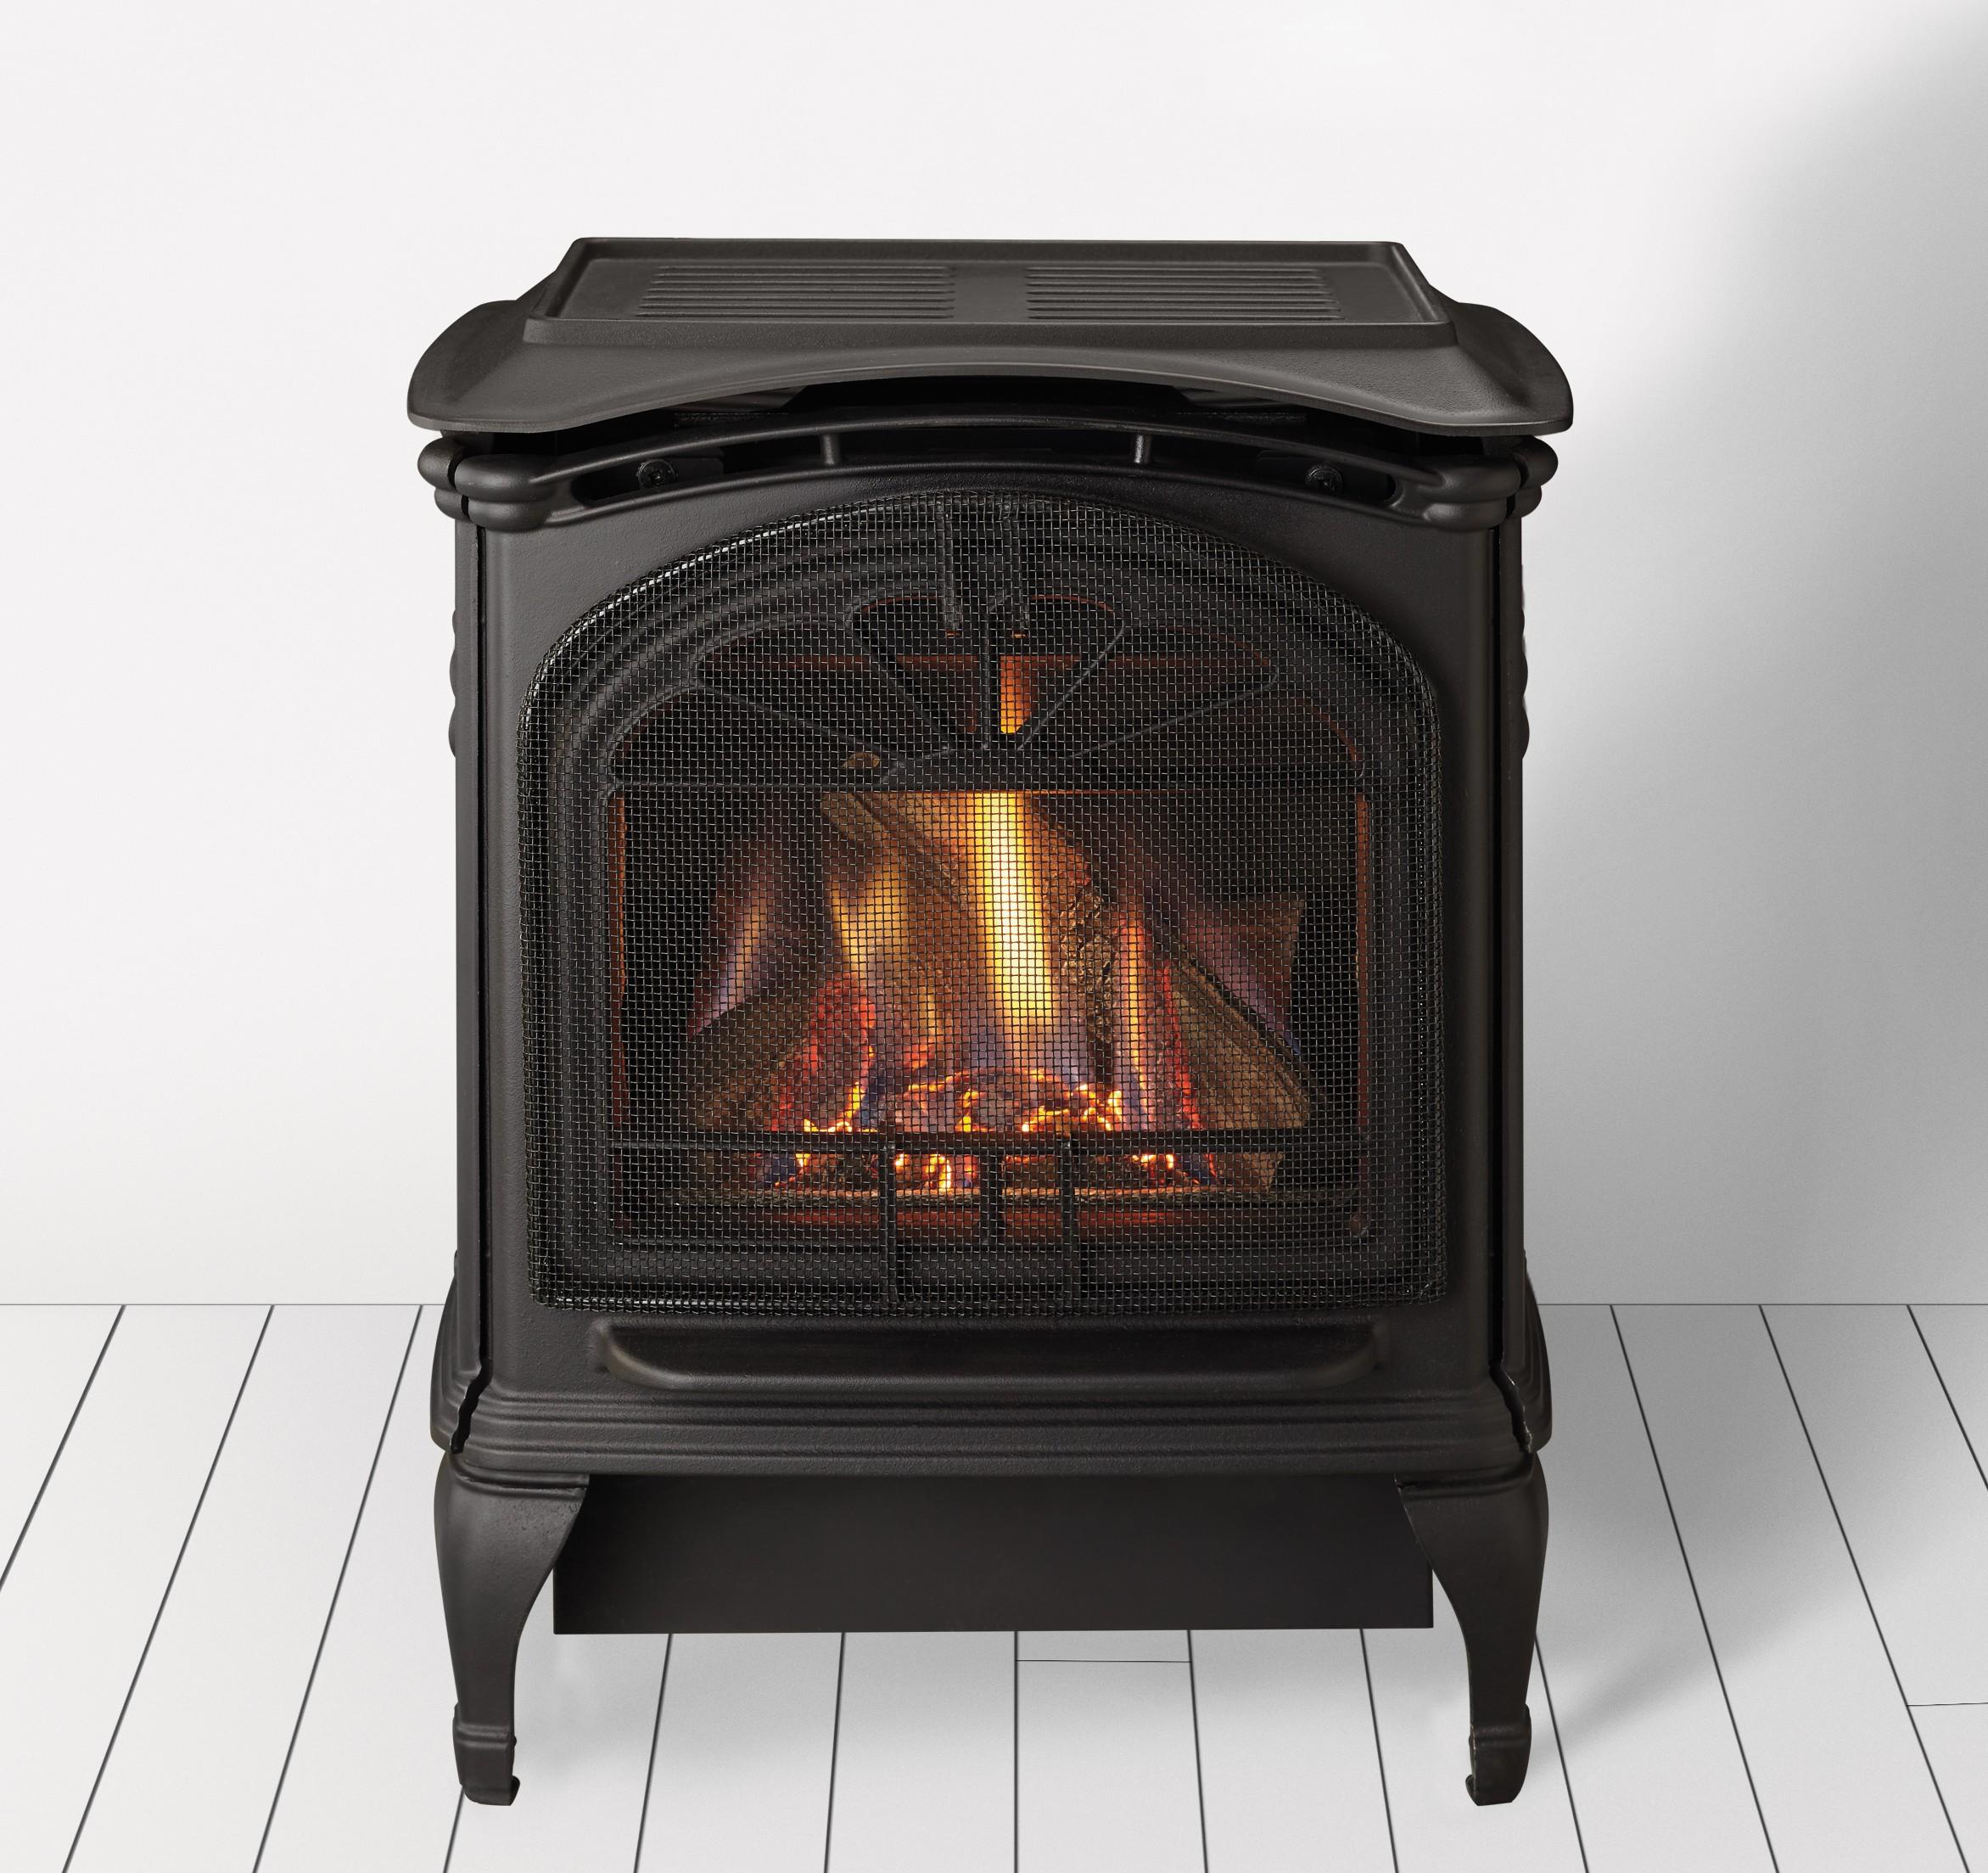 Top Heat Glo Tiara Petite Gas Stove E1443380263846 Heat Glo Twilight Ii Review Glo Primo Heat houzz-02 Heat And Glo